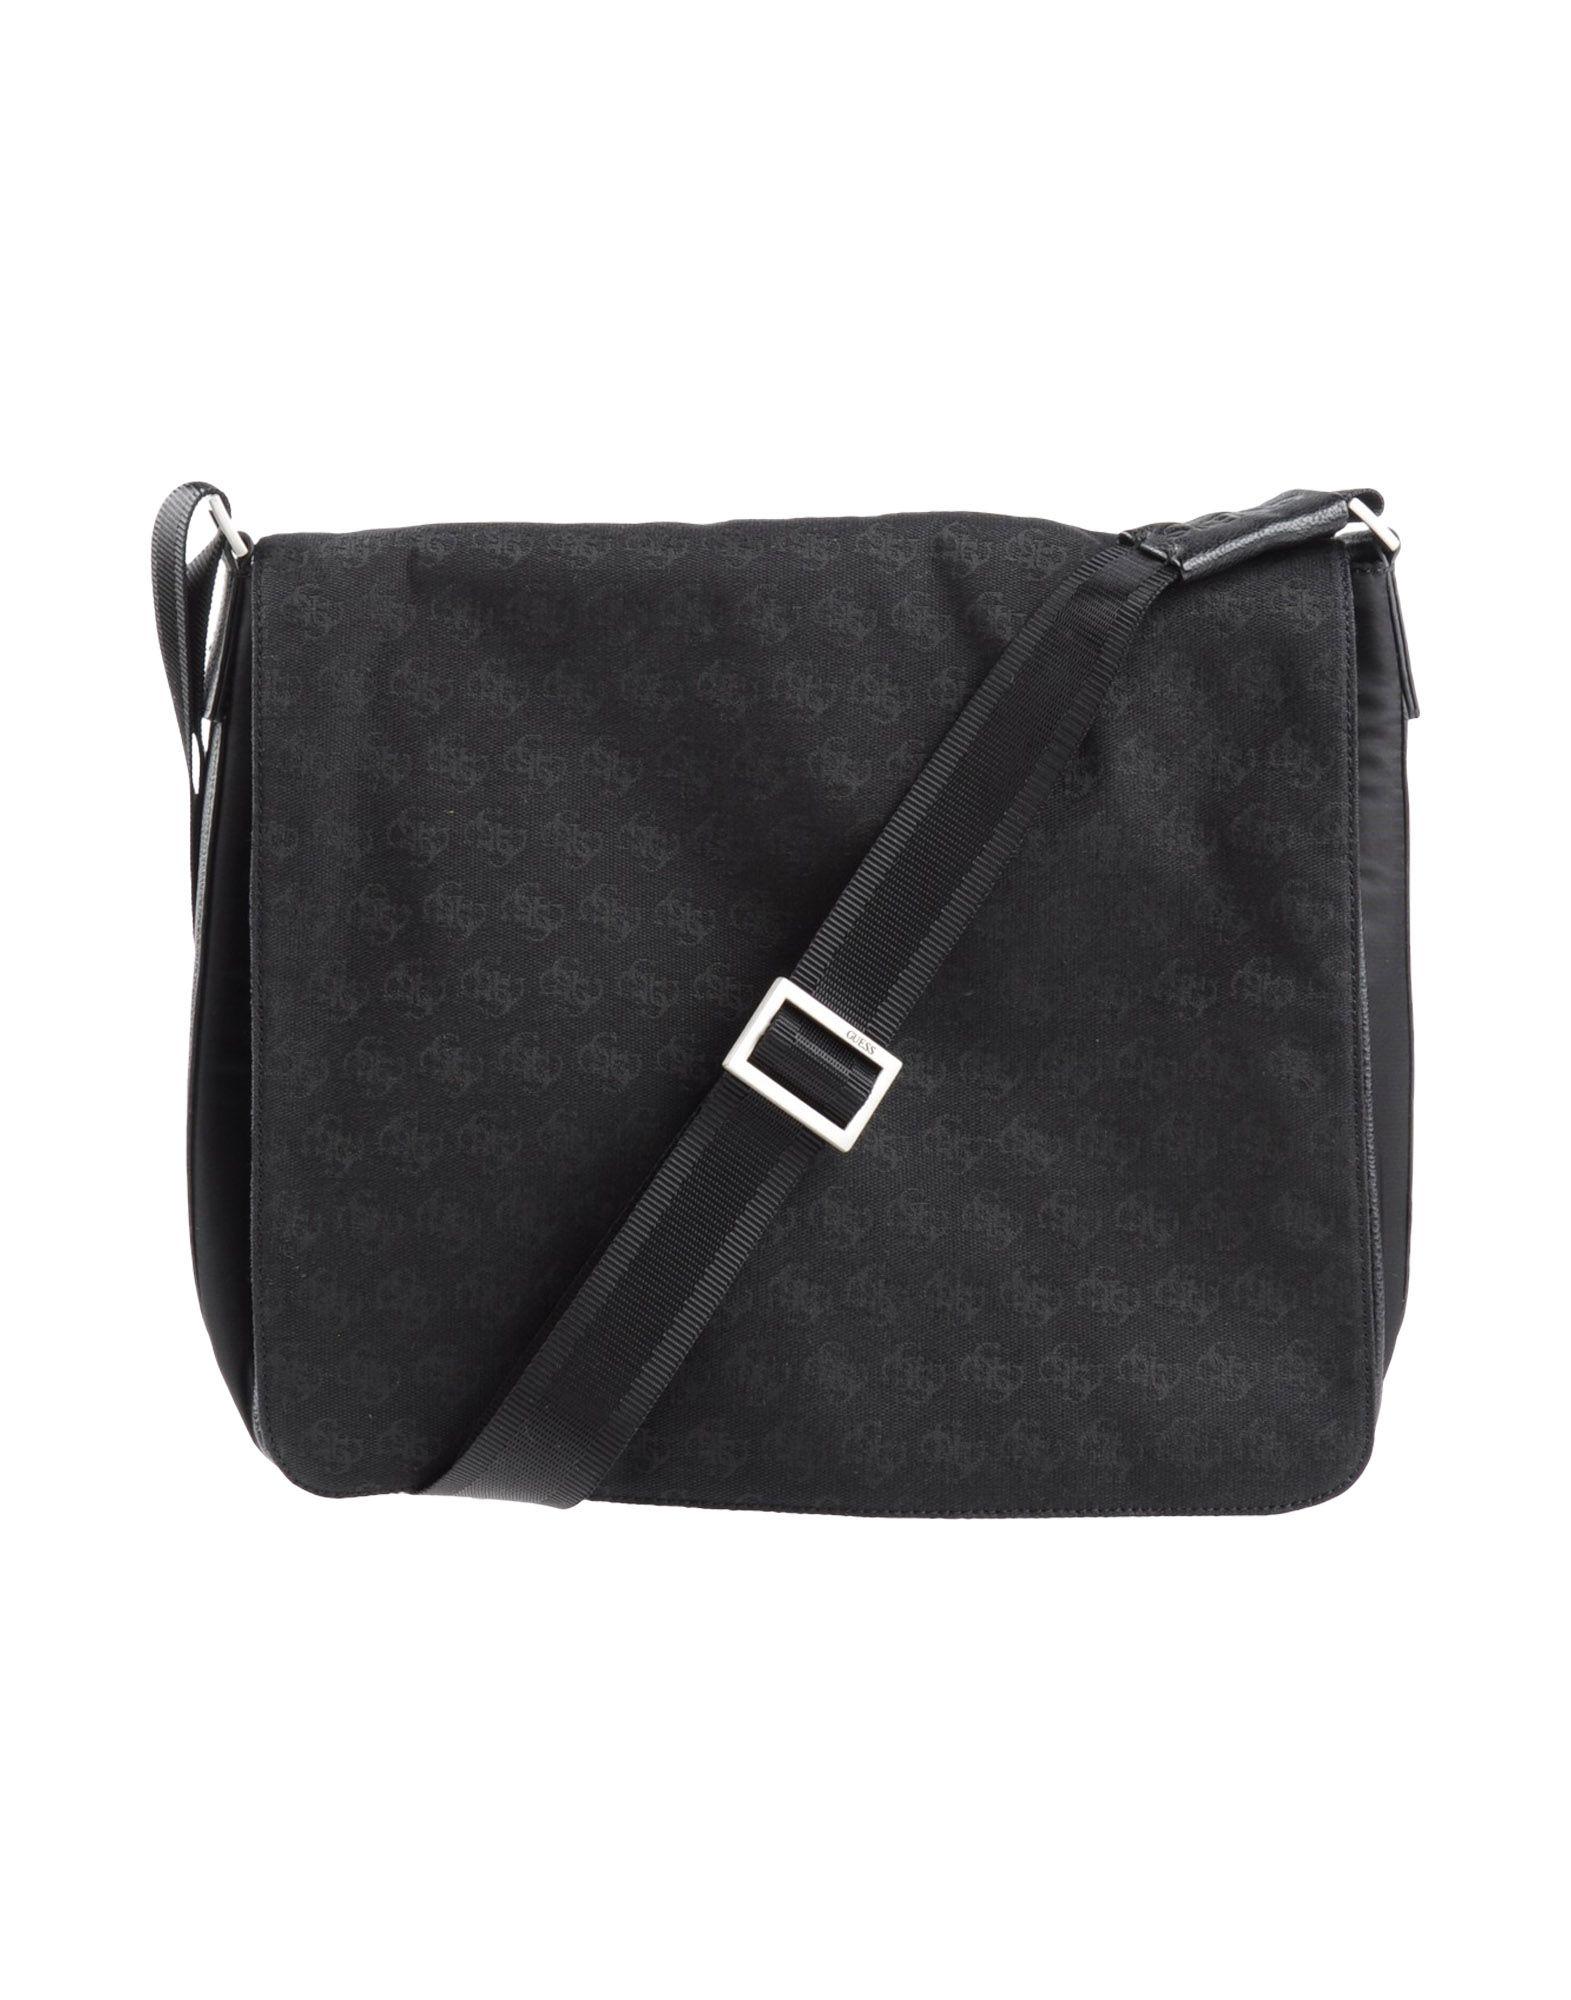 dac96d4f5f28 Lyst - Guess Cross-body Bag in Black for Men